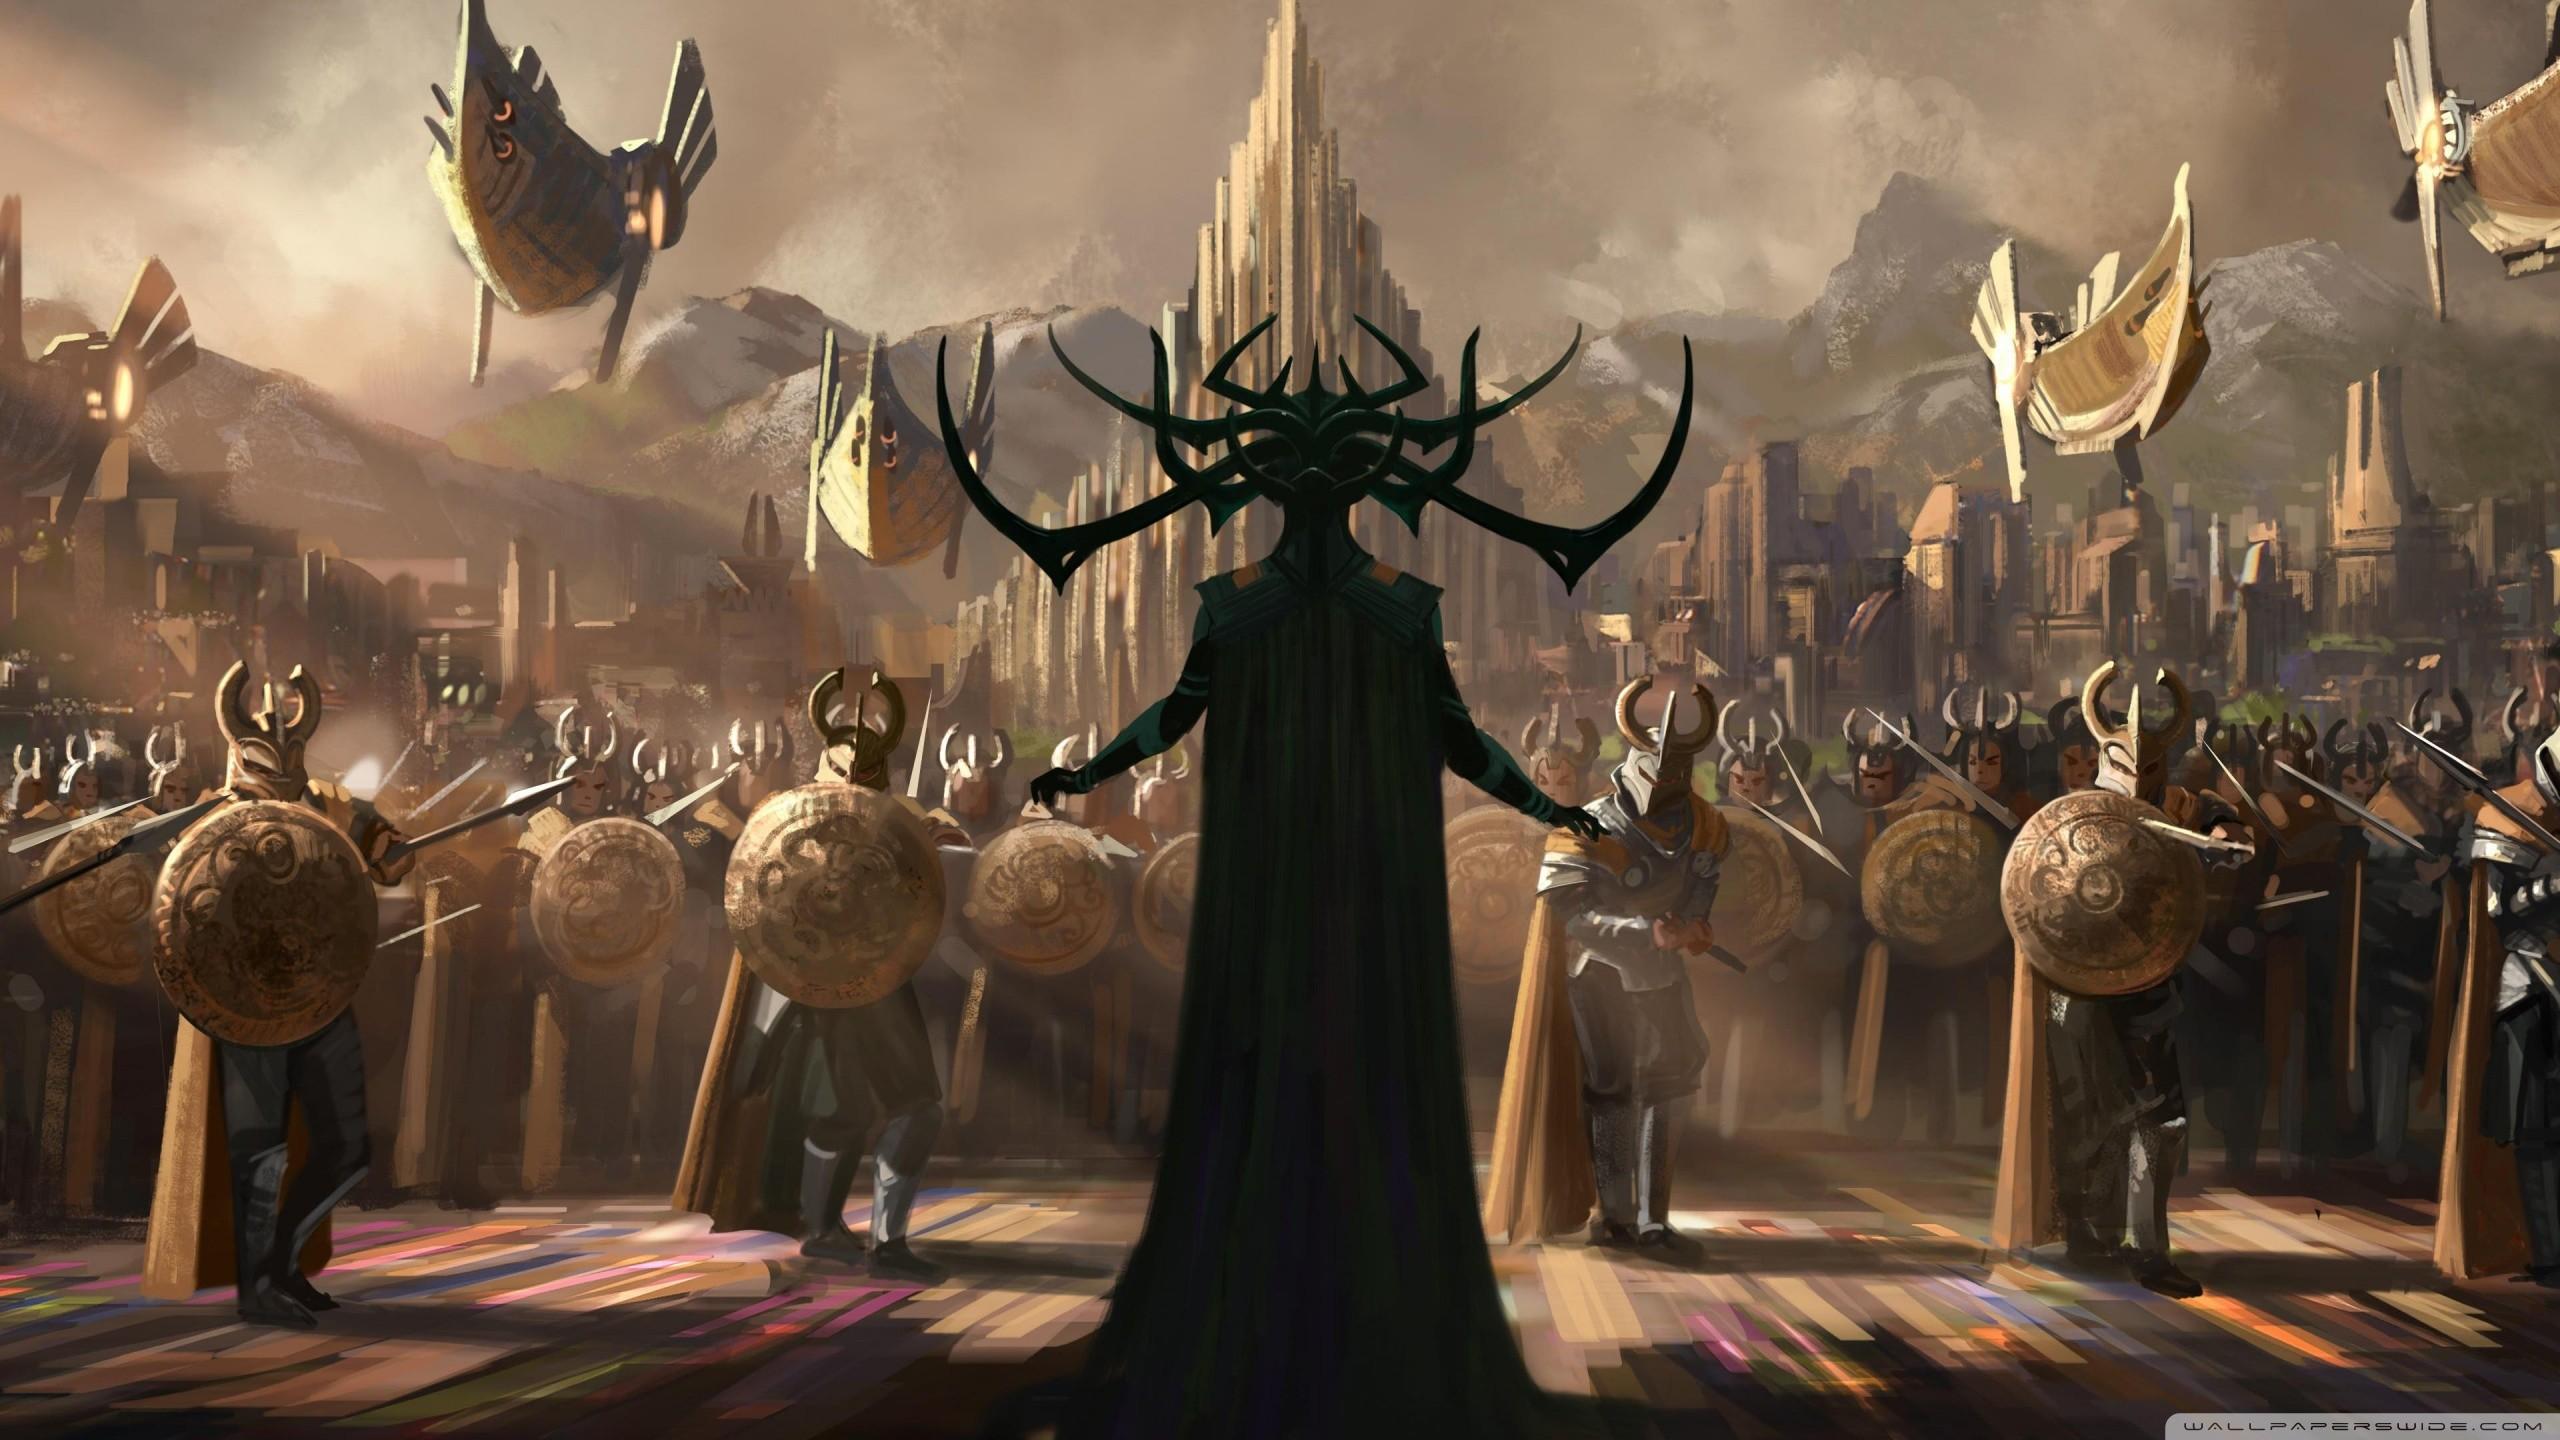 Thor Ragnarok HD Images 9 whb #ThorRagnarokHDImages #ThorRagnarok #movies # wallpapers #hdwallpapers